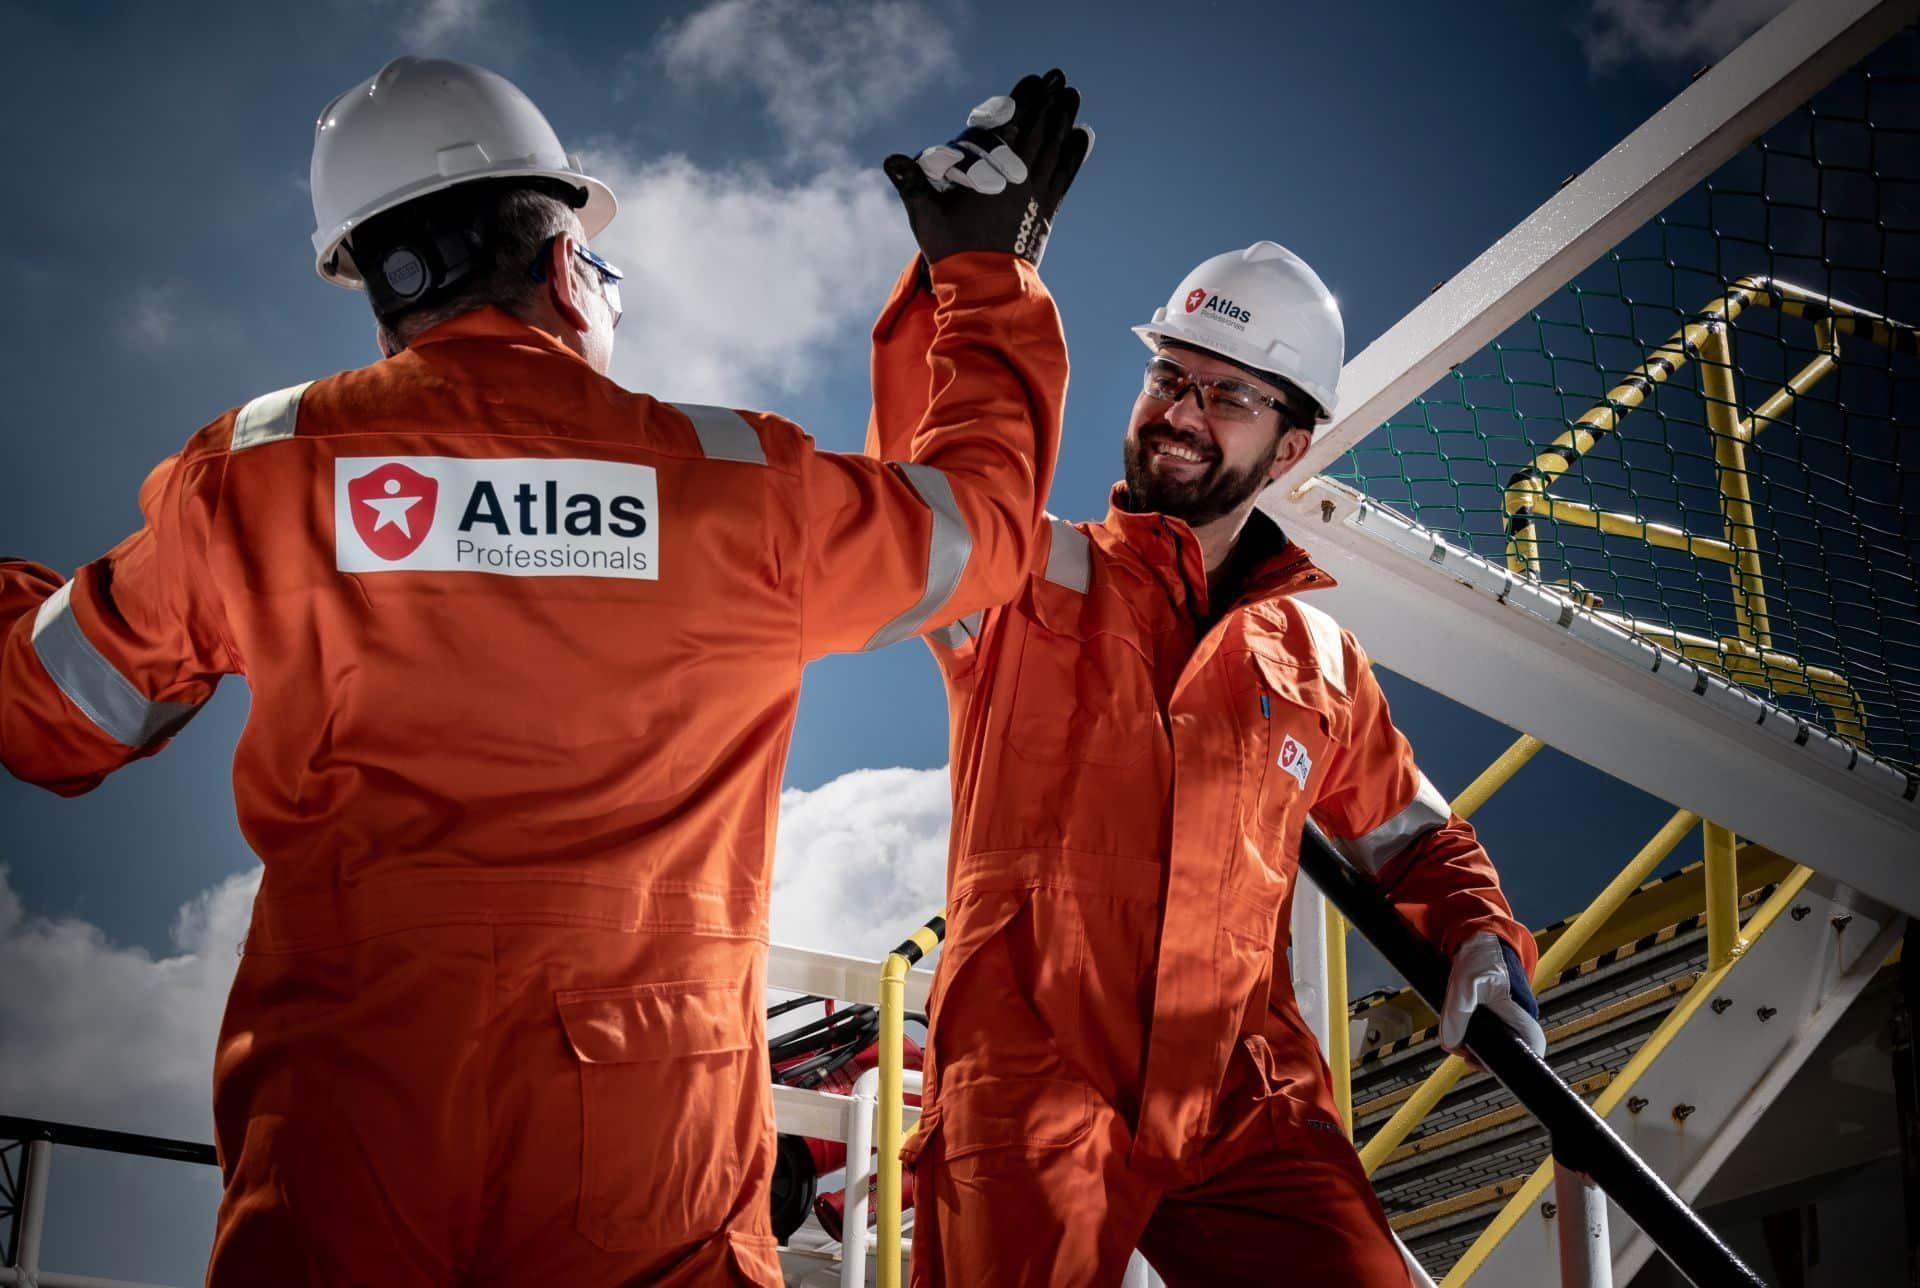 atlas, vagas, offshore, eletricista, mecânico